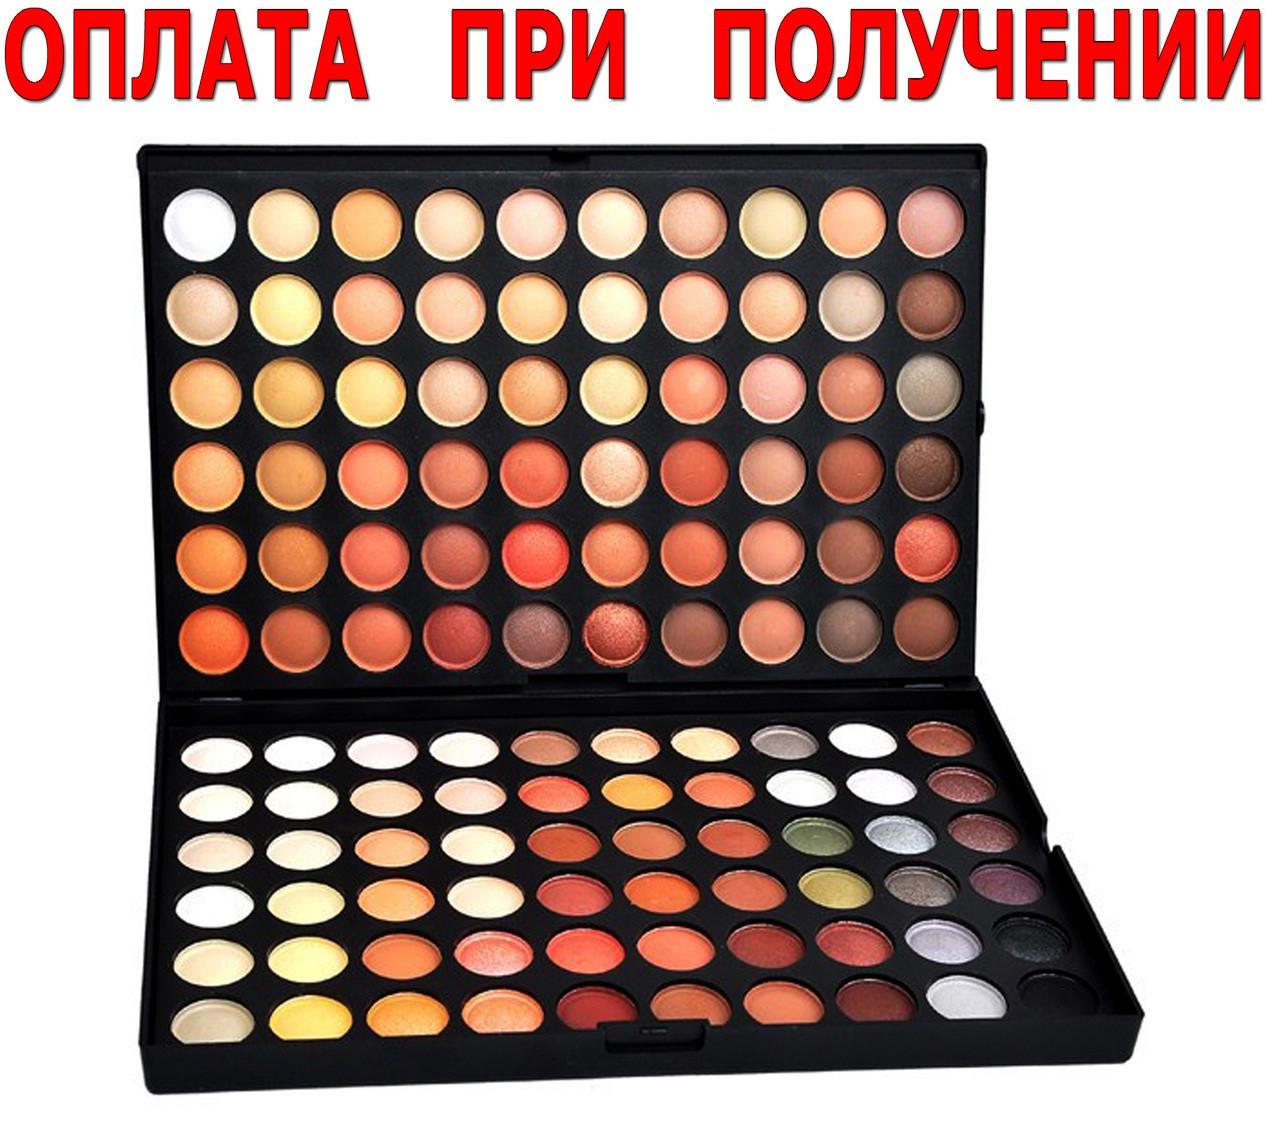 Тени теплых тонов 120 цветов Mac Cosmetics №4 палитра теней палетка  реплика